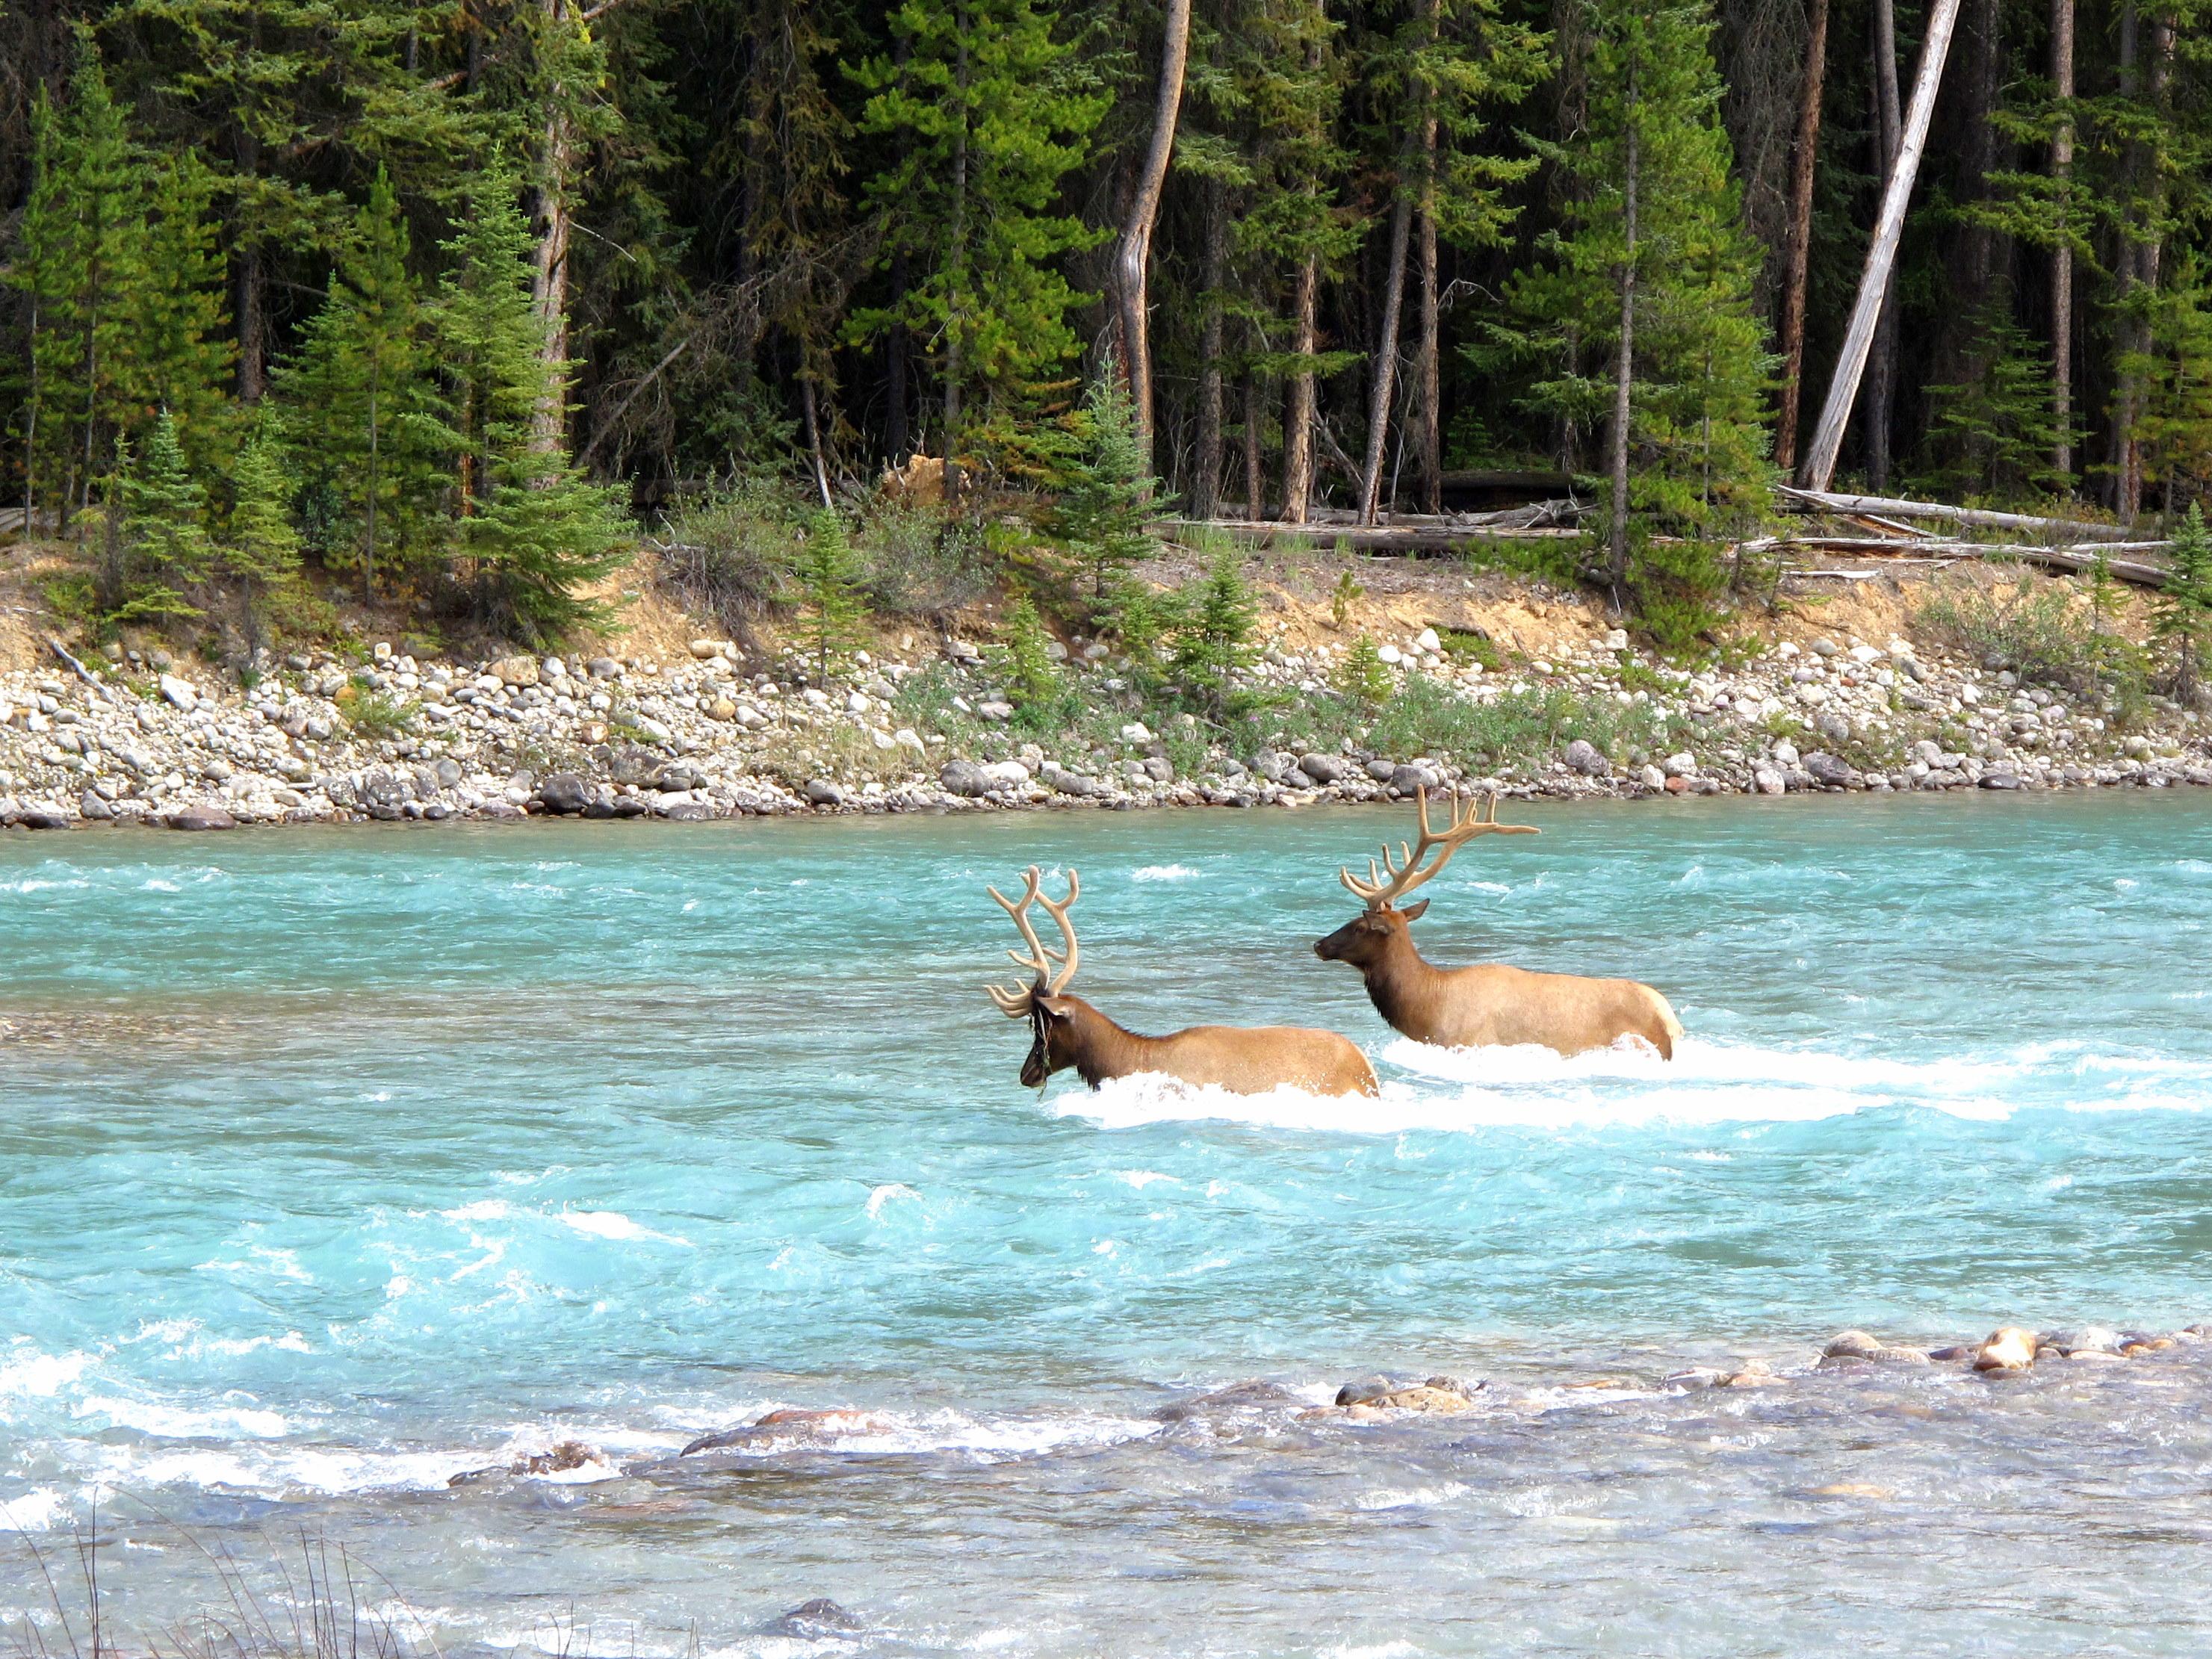 Canadian Rockies Road Trip – Photo Blog (part 2)